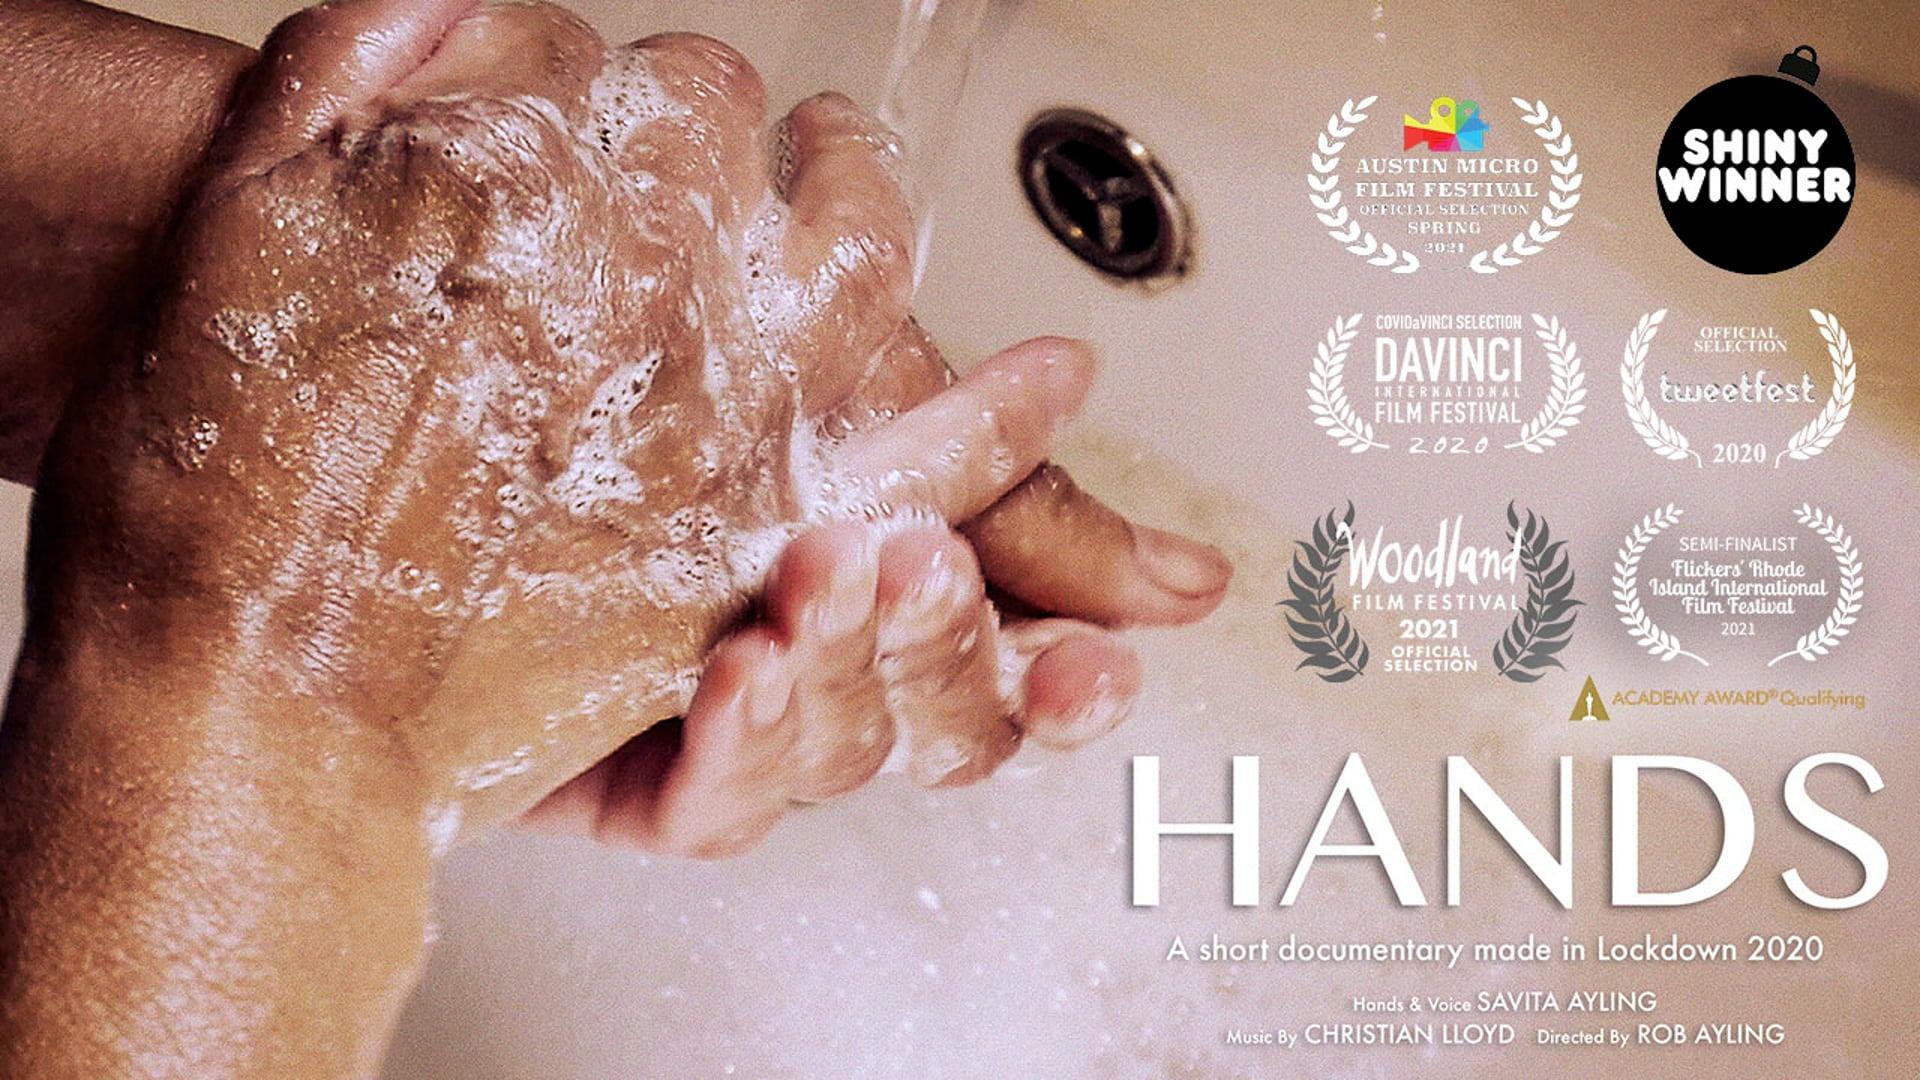 HANDS - A Lockdown Short Documentary Film